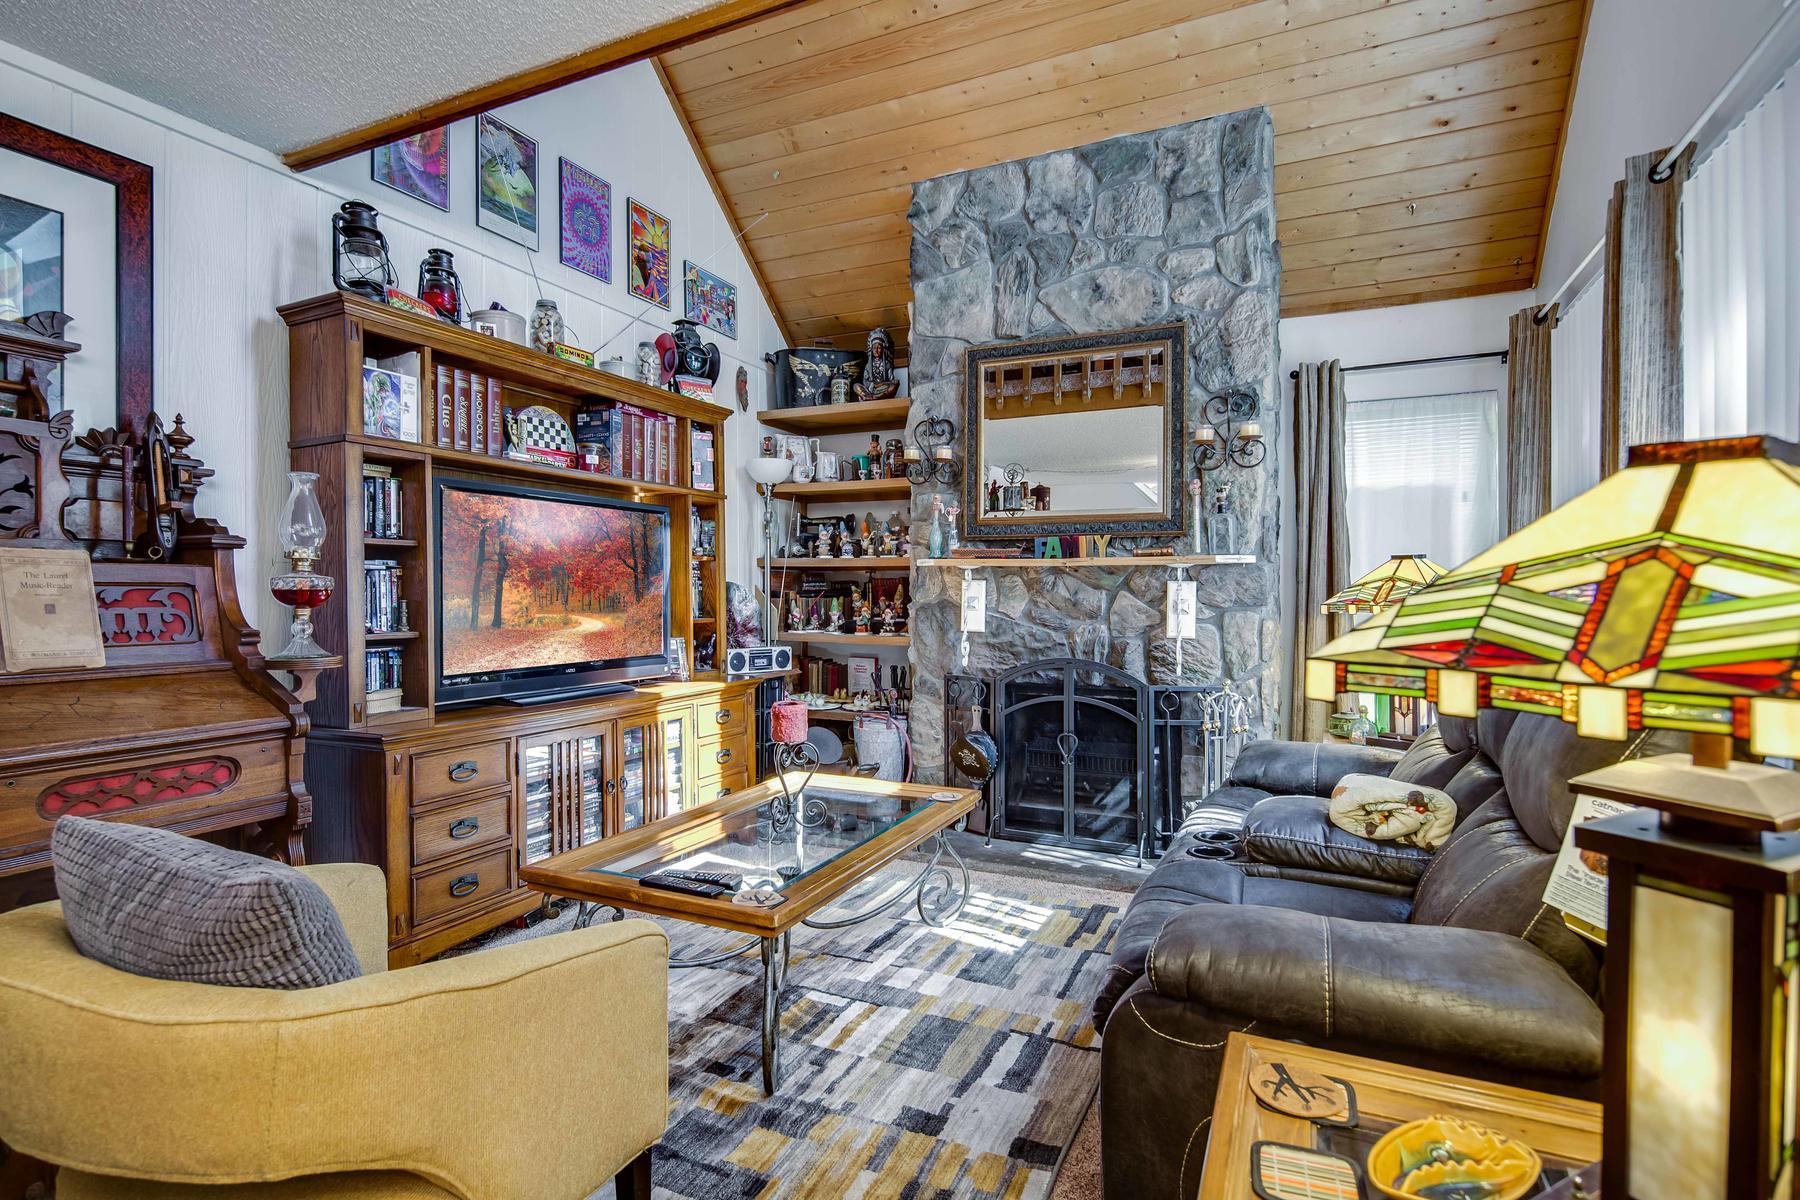 Additional photo for property listing at 2469 South Xanadu Way #C 2469 South Xanadu Way #C Aurora, Colorado 80014 United States